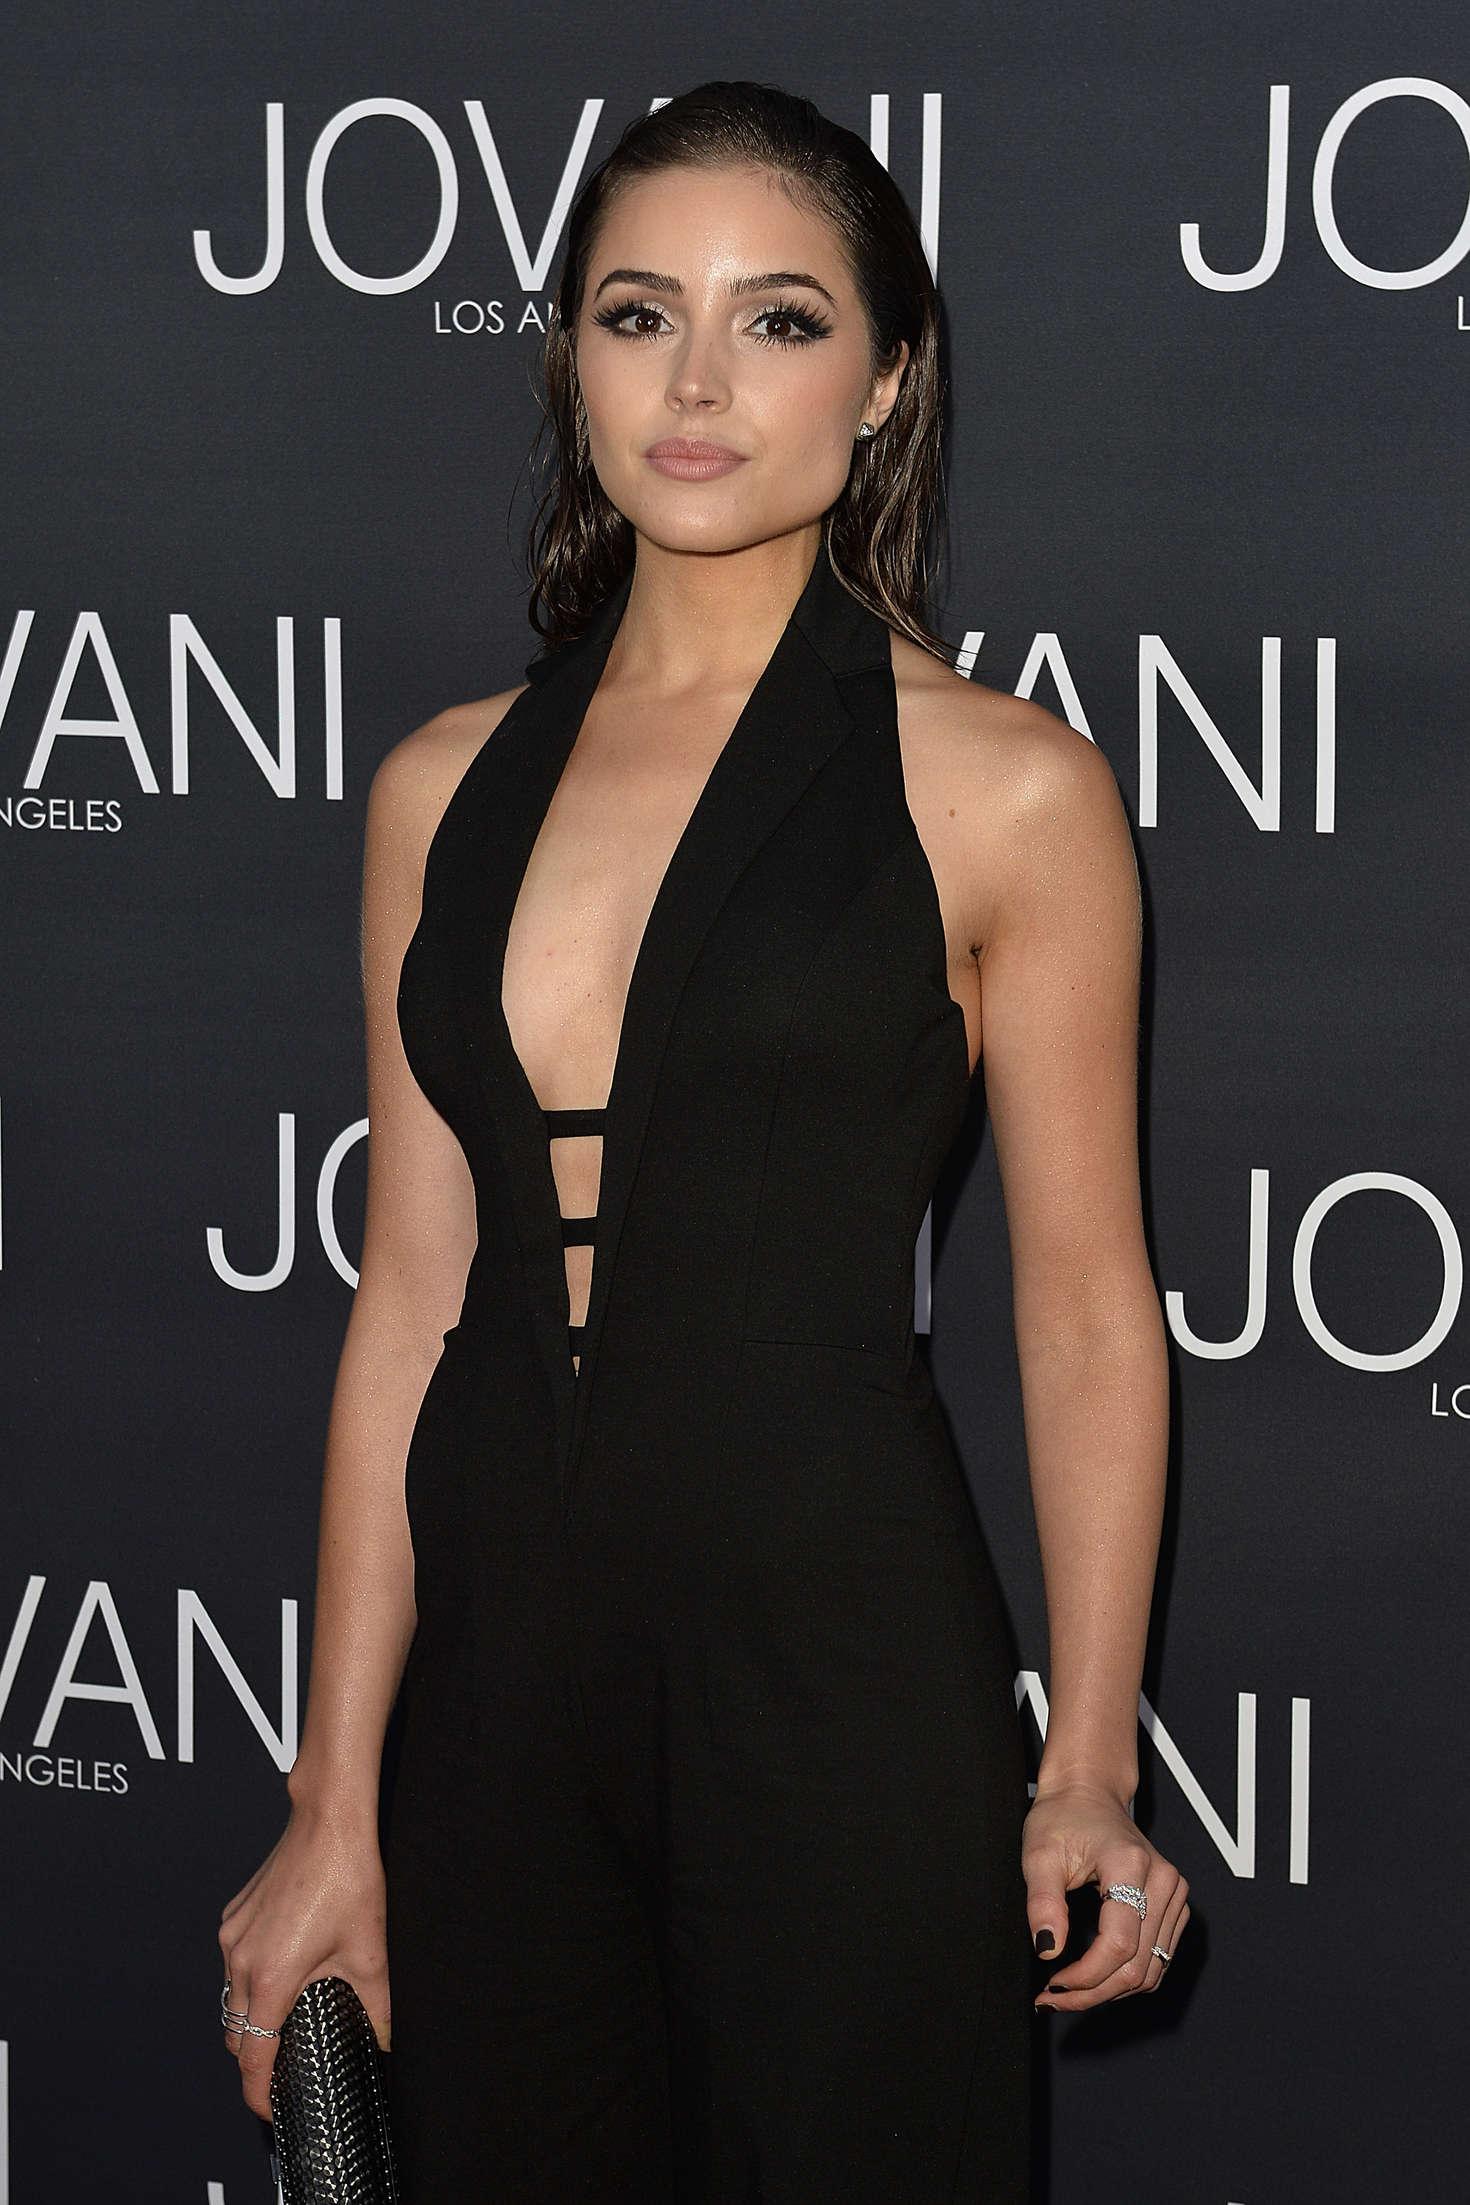 Olivia Culpo 2016 : Olivia Culpo: Jovani Los Angeles Store Opening Celebration -09